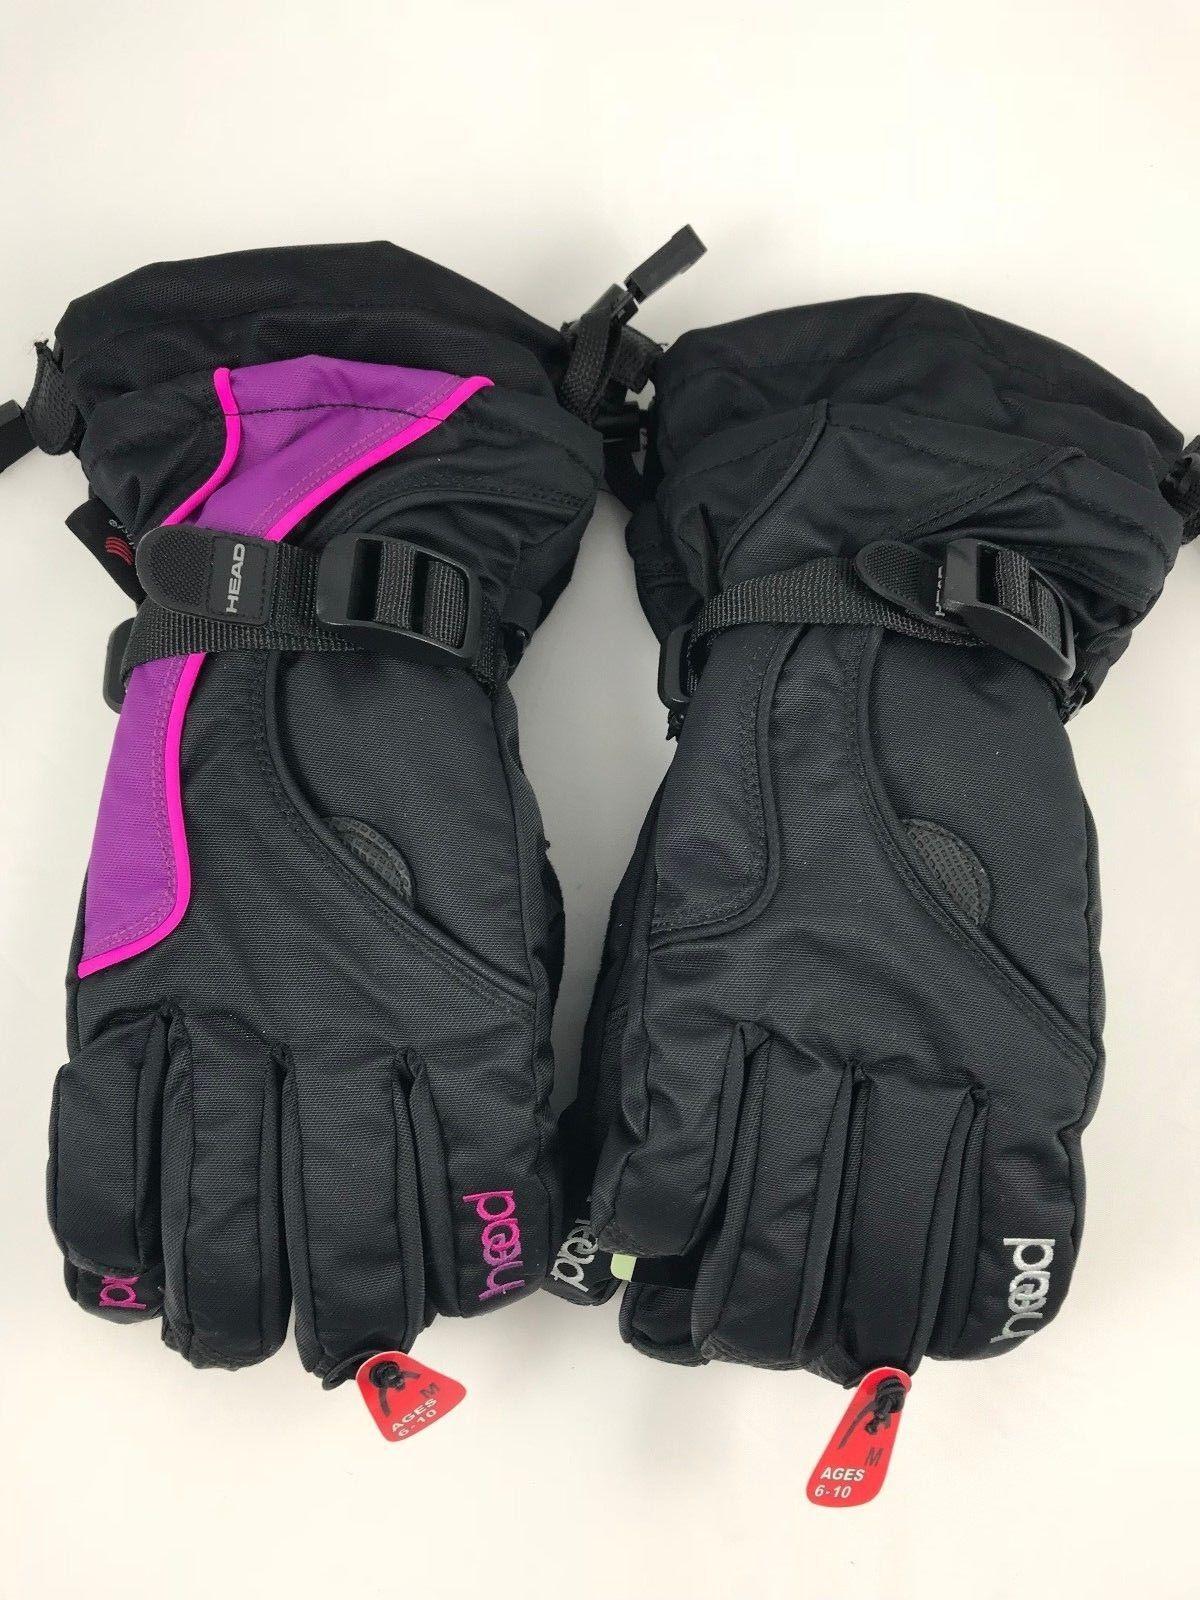 HEAD Jr Ski Gloves With Pocket Black purple pink Dupont Sorona